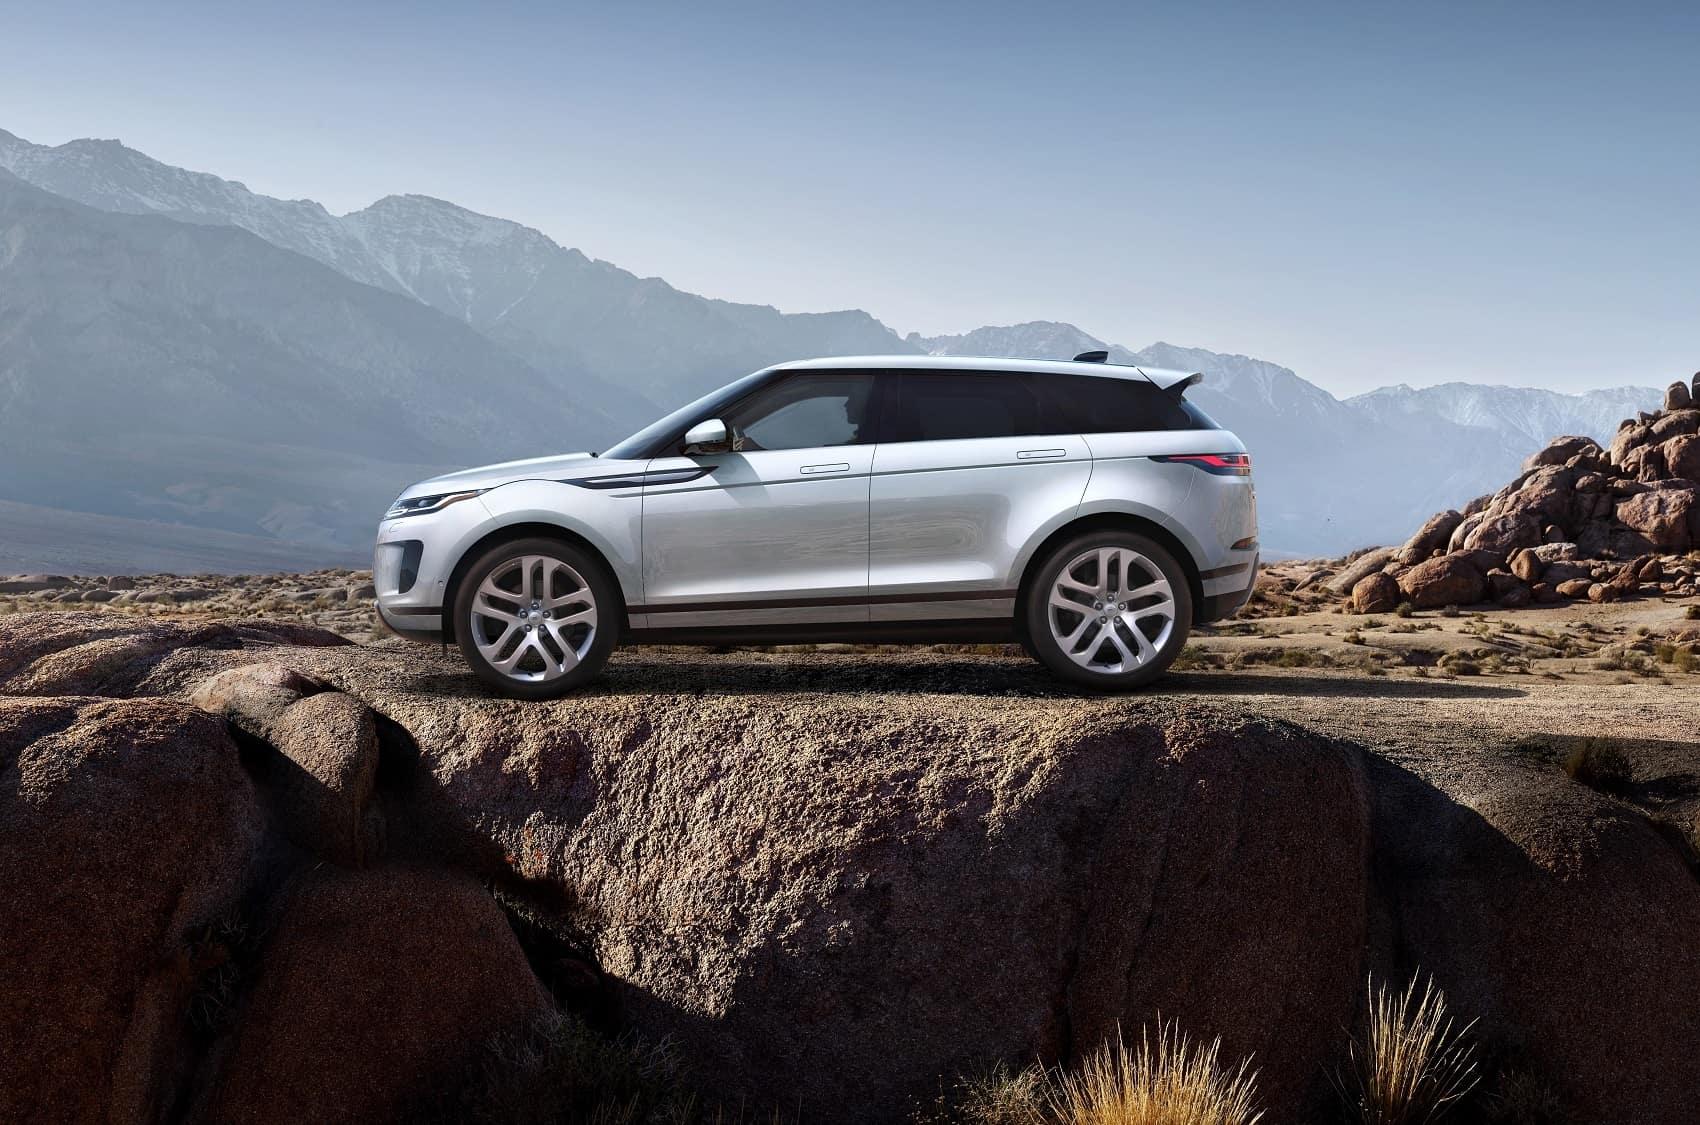 Range Rover Evoque Exterior Style